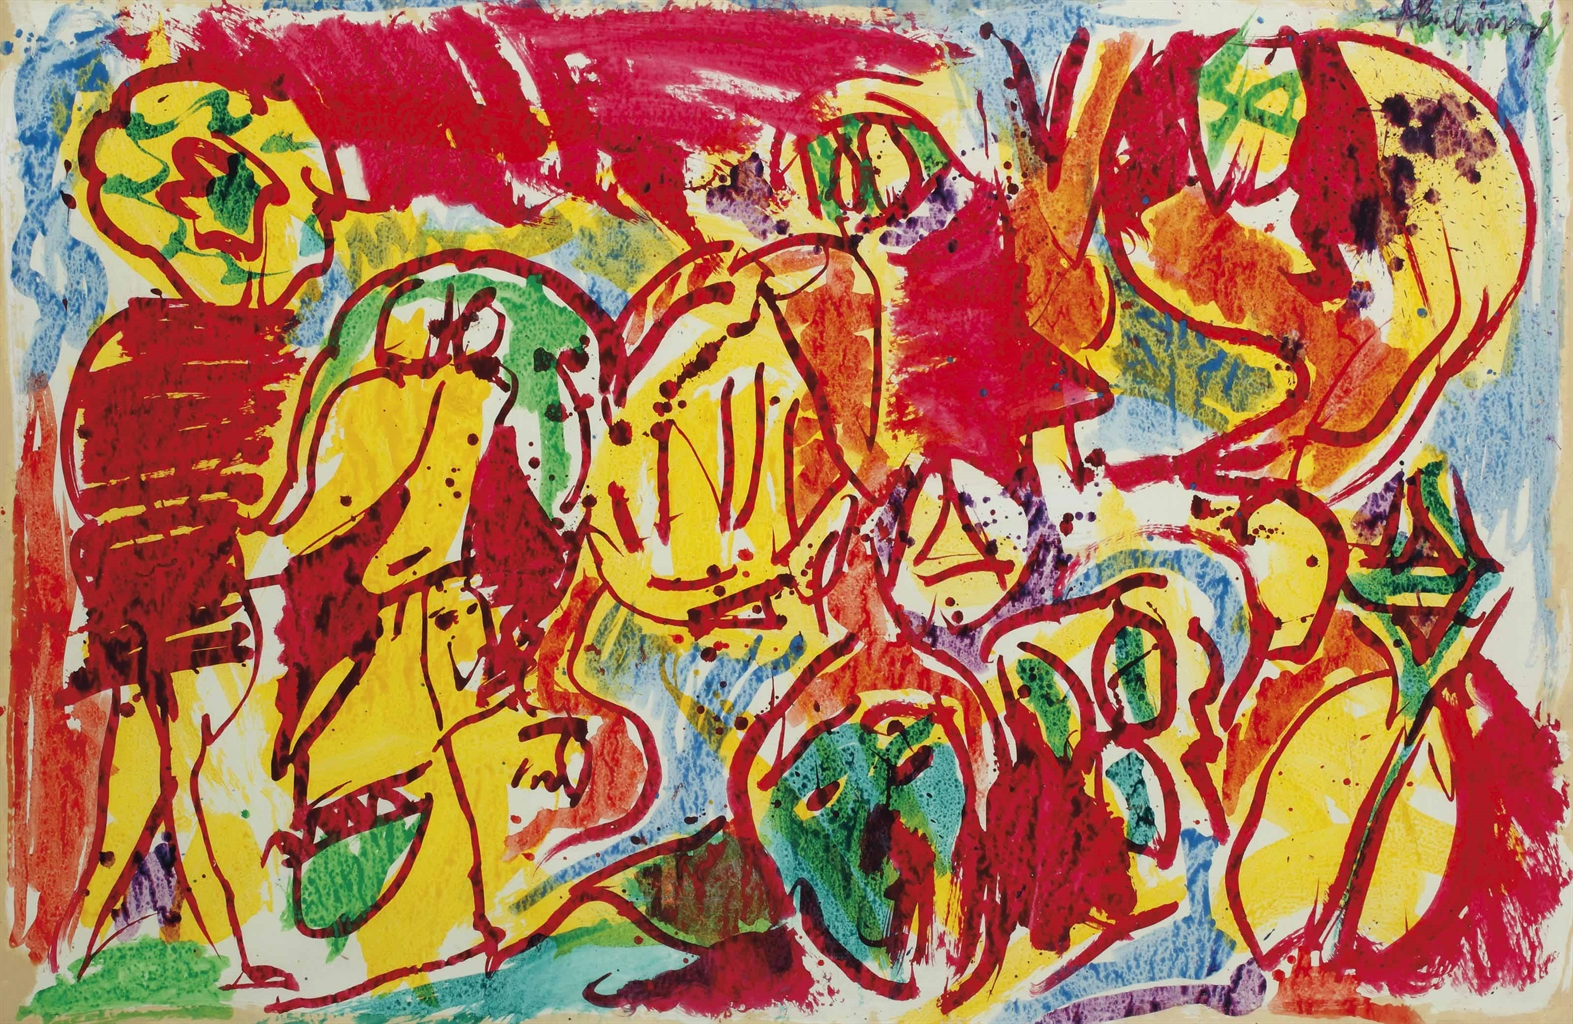 Pierre Alechinsky-L'Ordinaire du Perou (The Ordinary from Peru)-1972